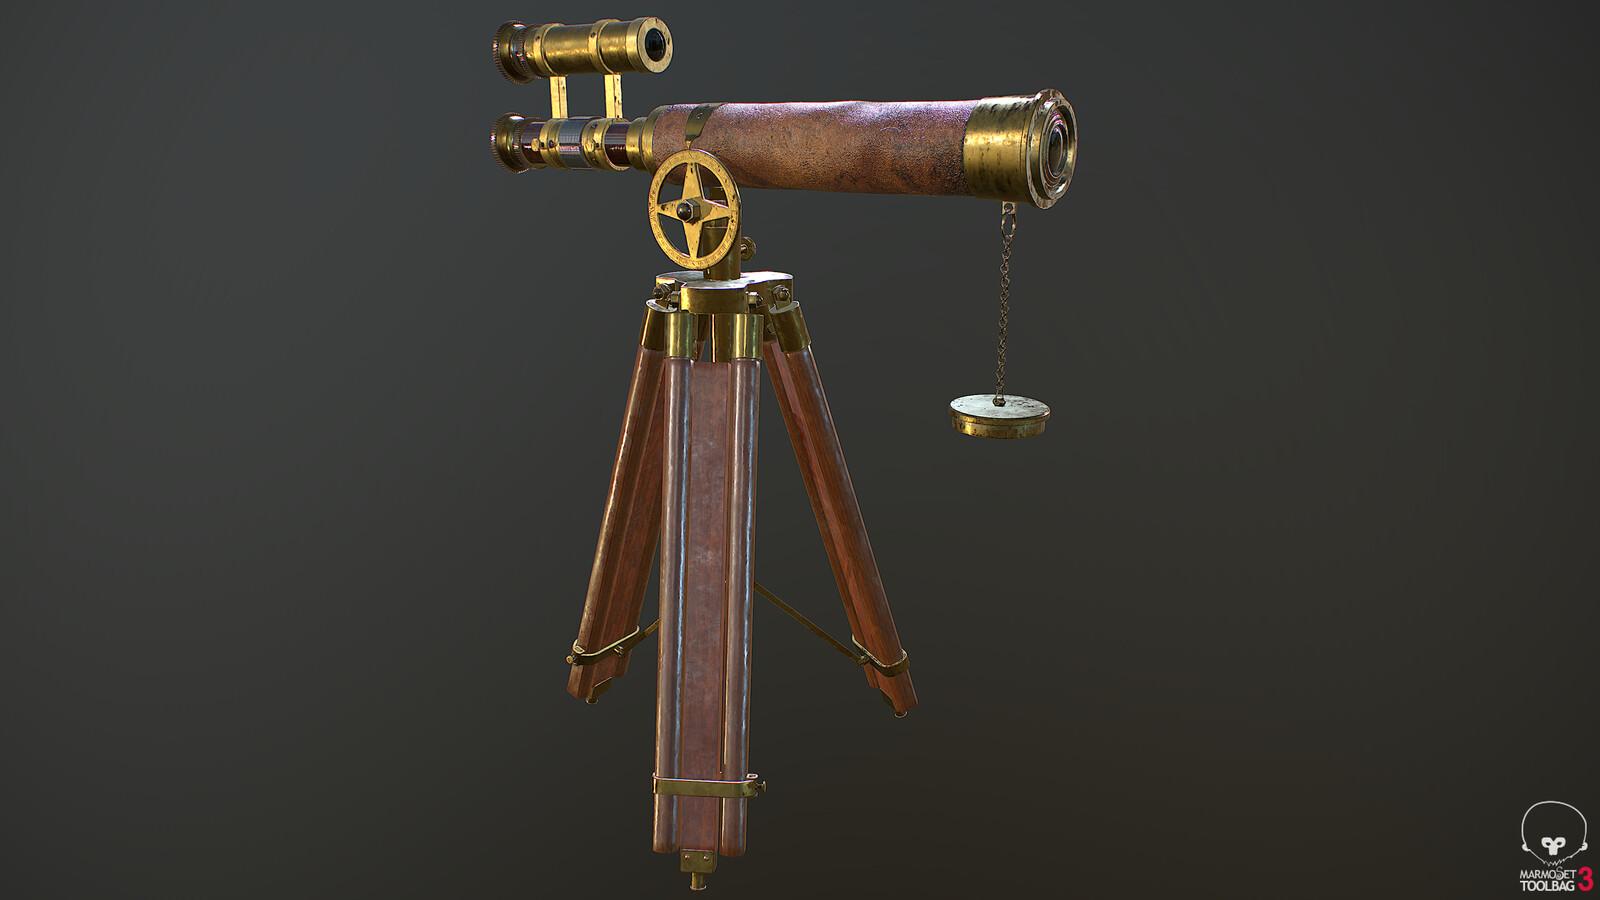 Nautical Telescope